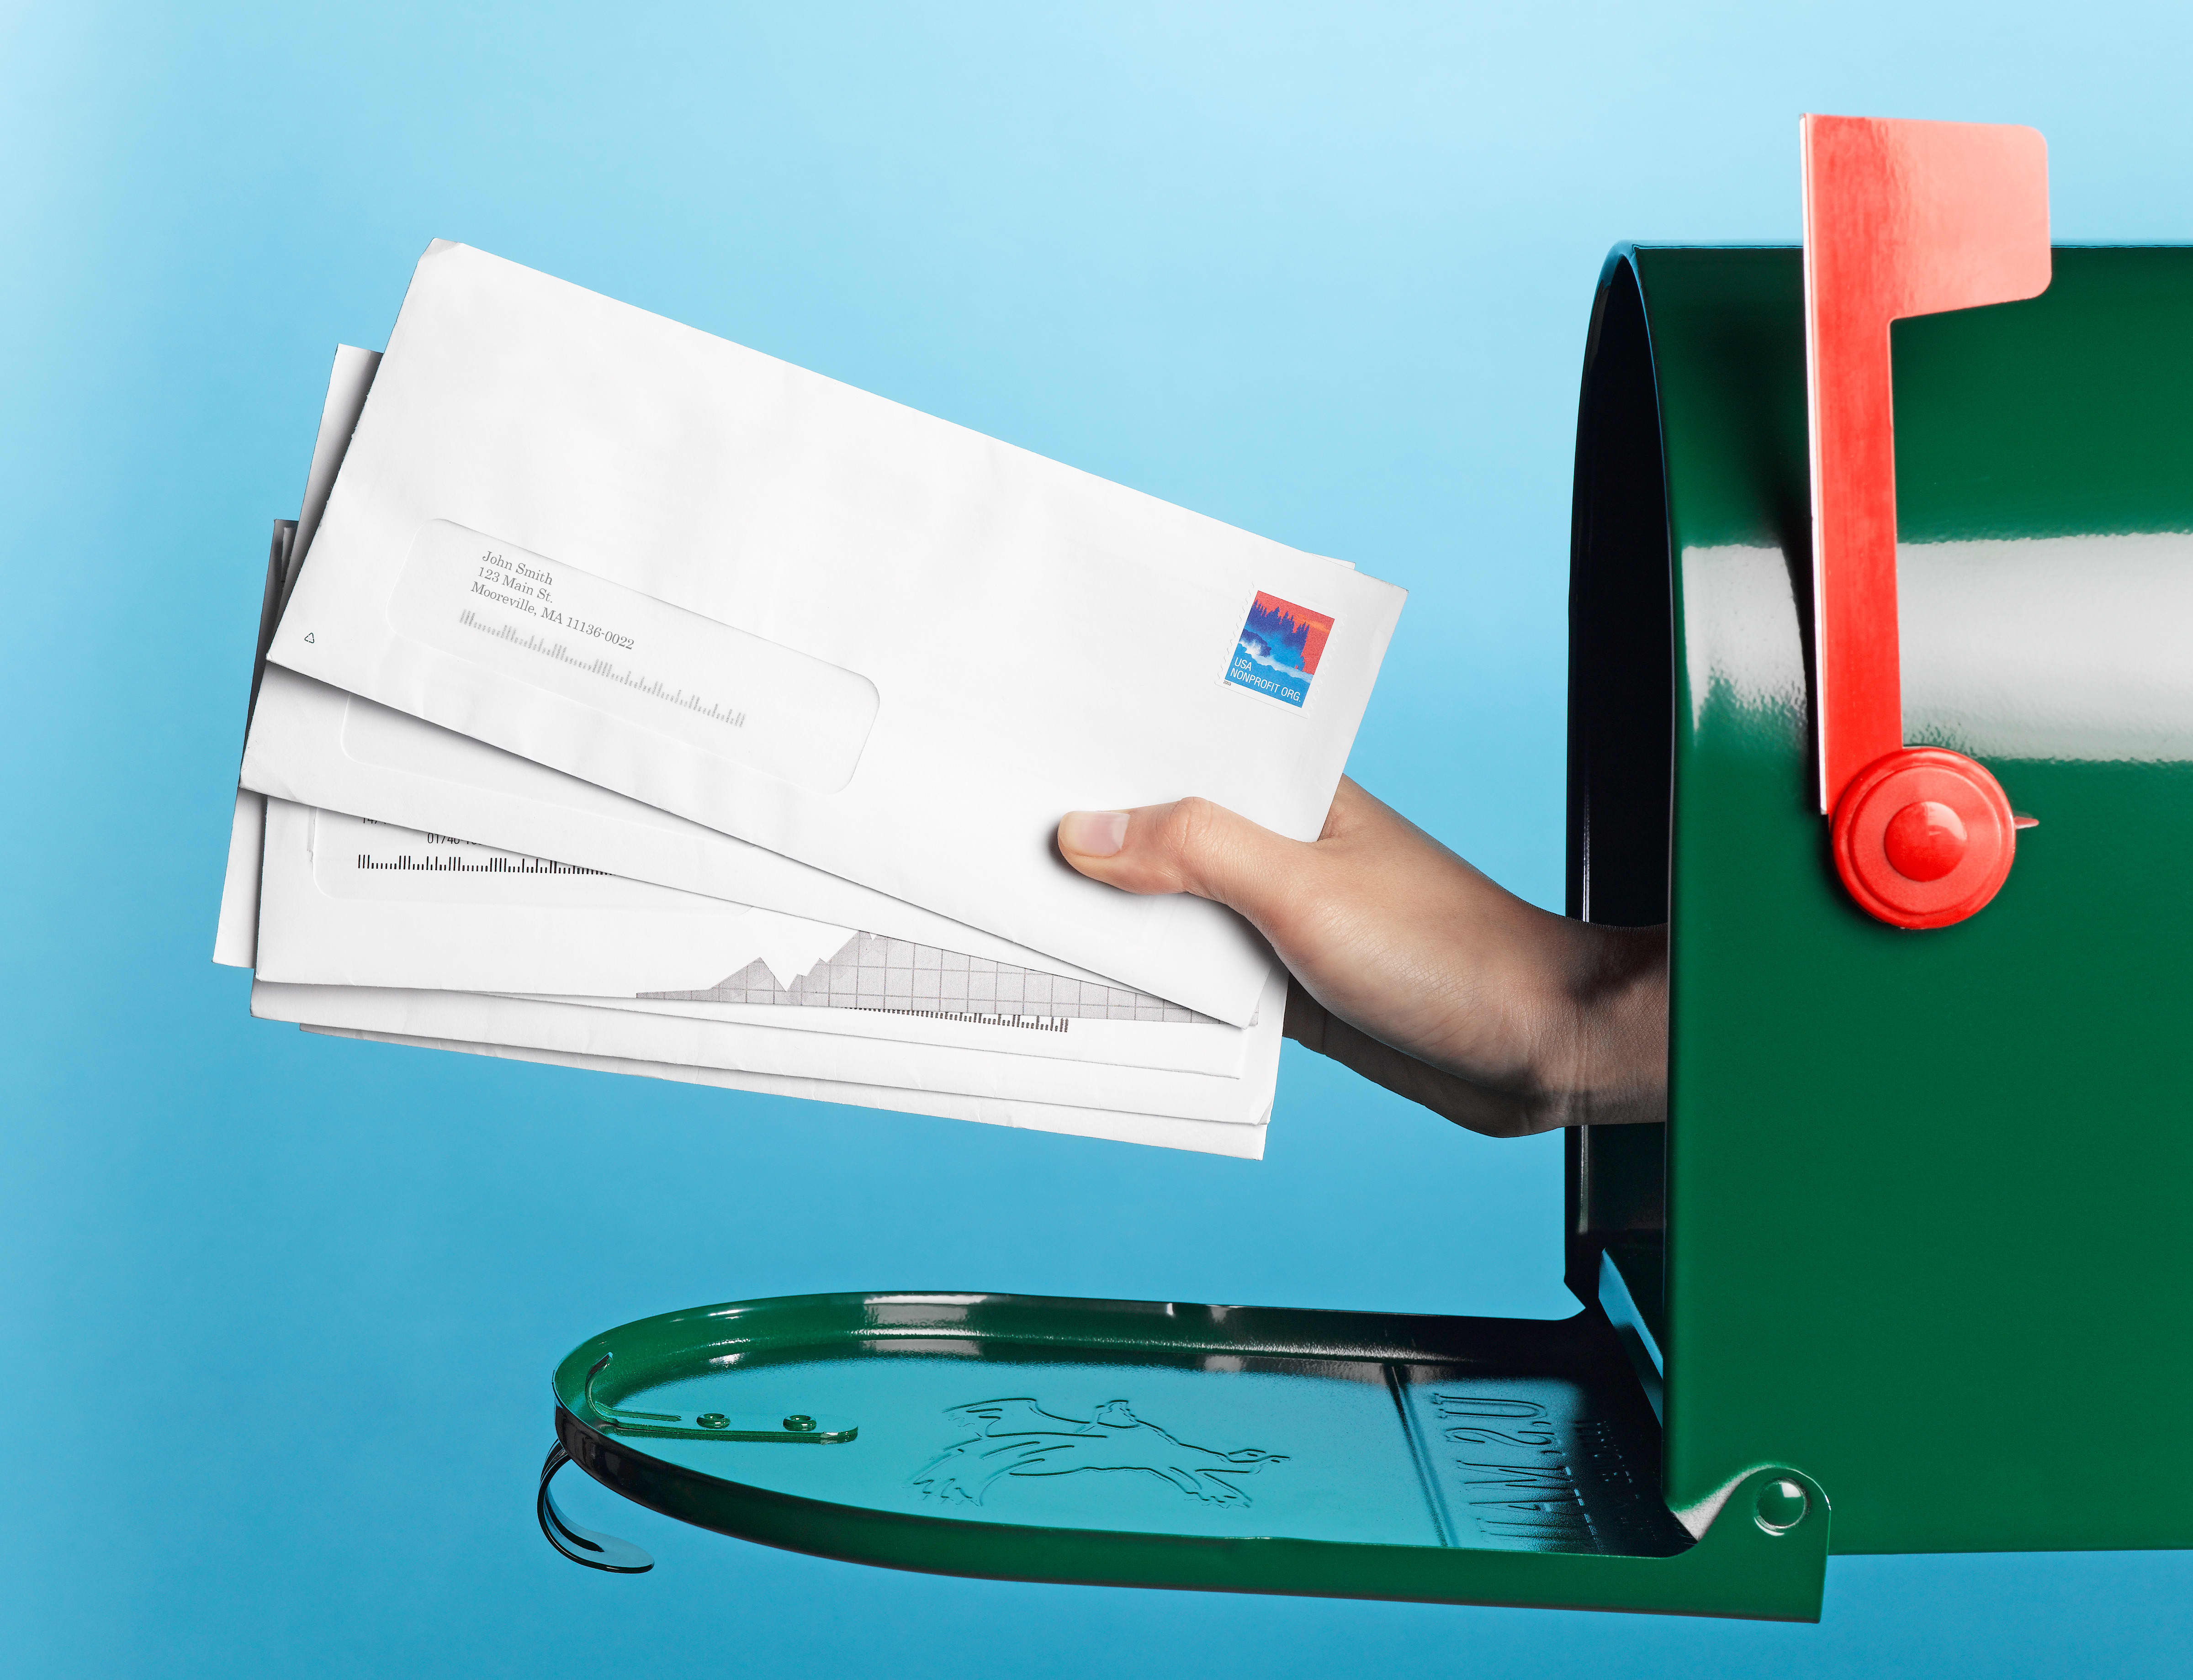 postal money order filled out wrong